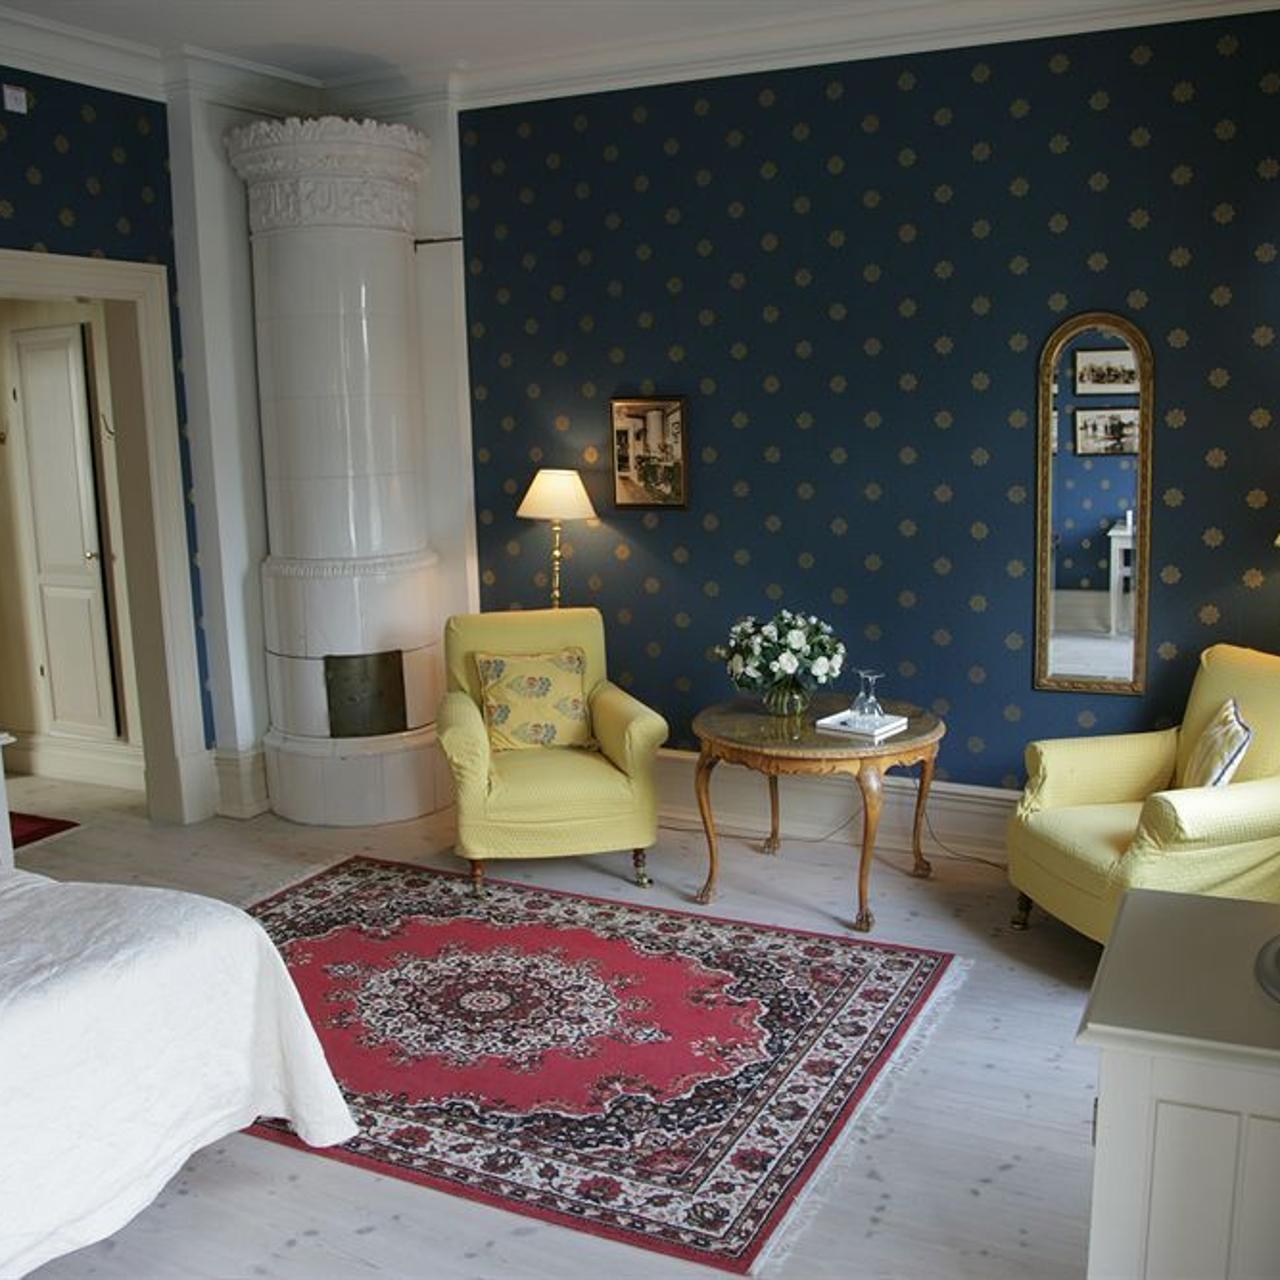 Grand Hotel Marstrand 4 Hrs Star Hotel In Tjorn Vastra Gotalands Lan